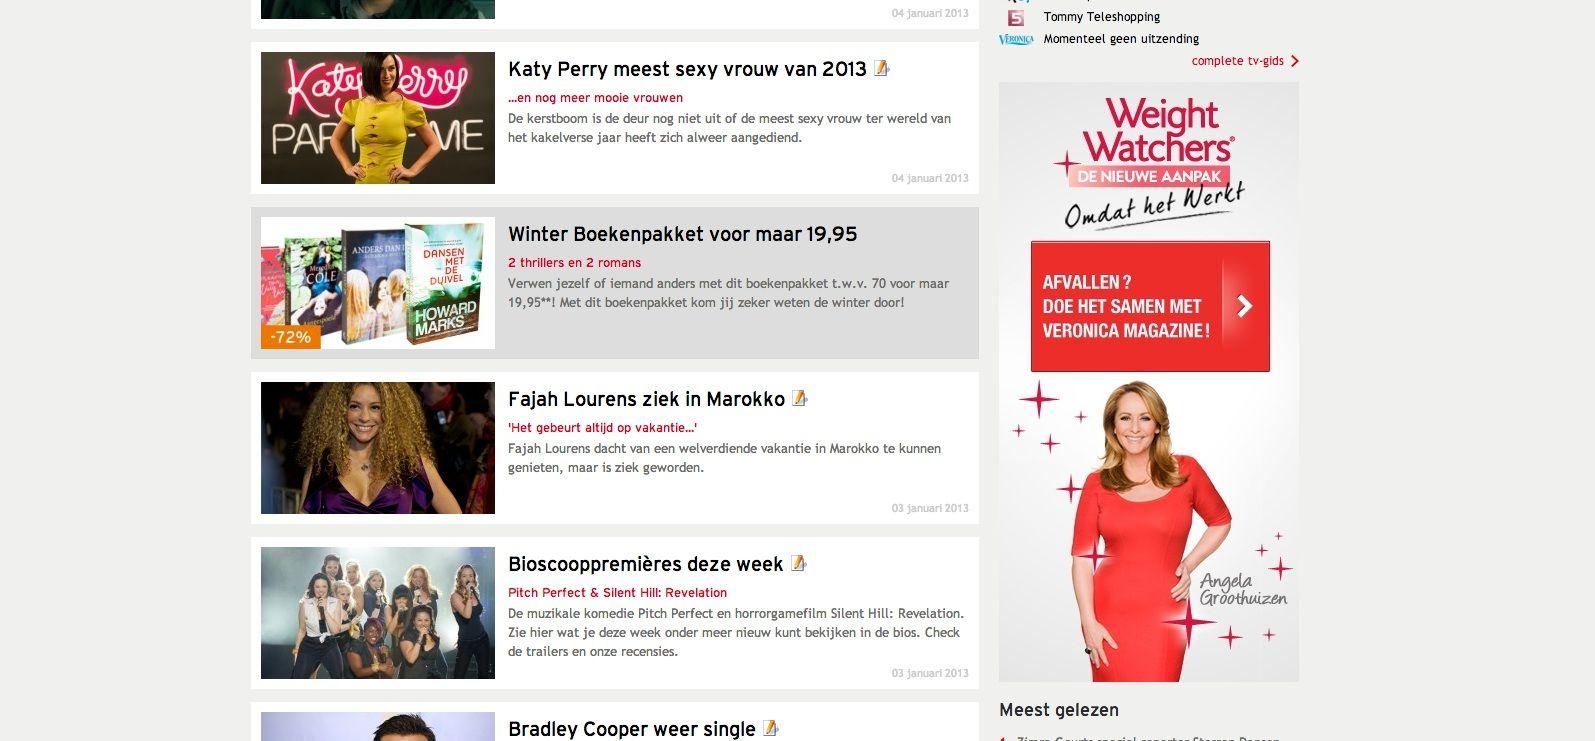 Klant: Weigt Watchers, Campagne: Oproep afvallen met Angela Veronicamagazine.nl Half Page